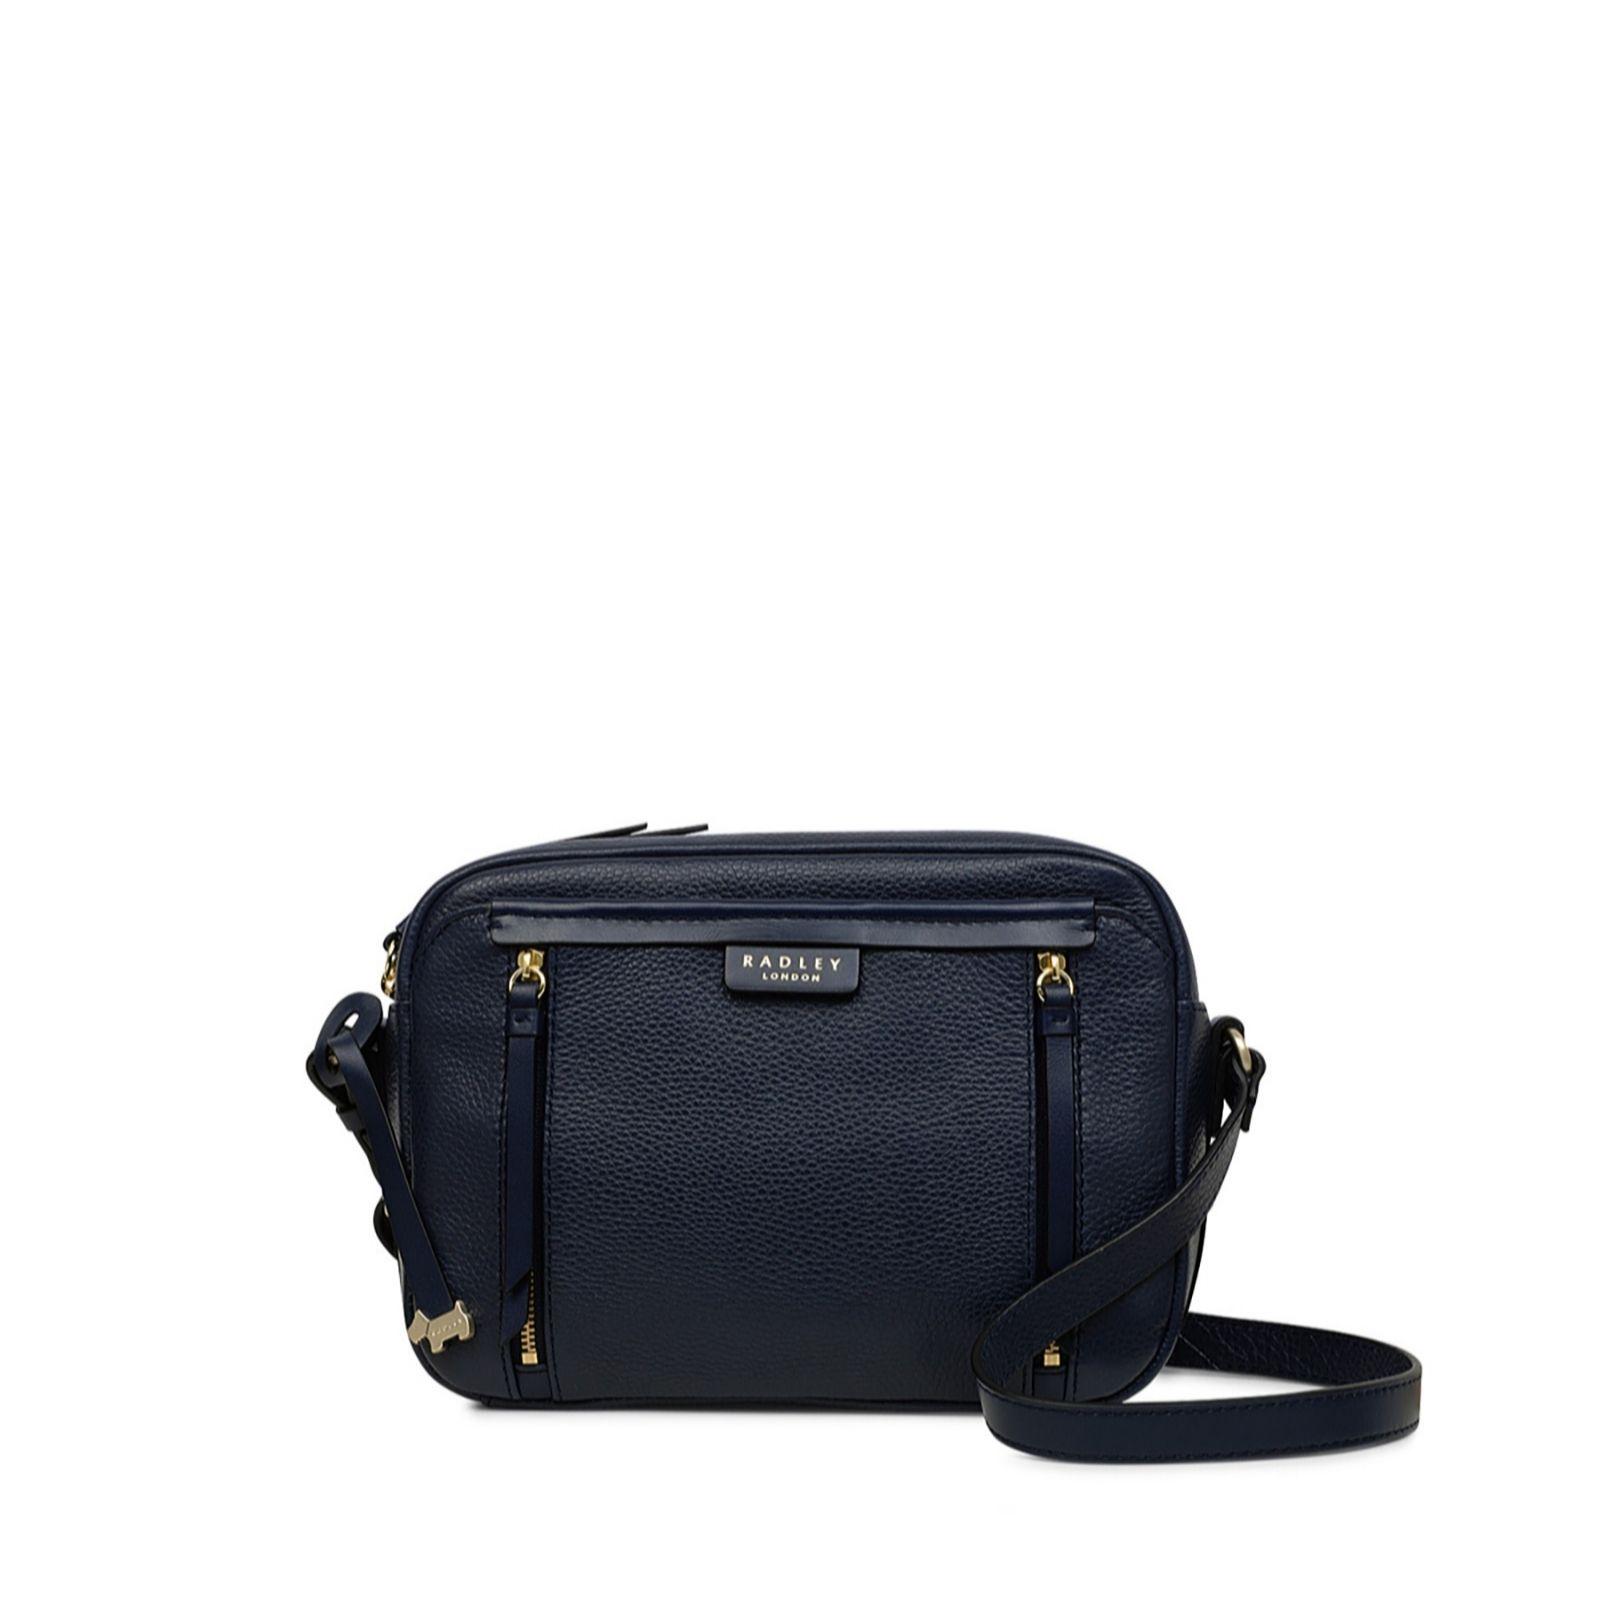 Frank Goog.yu Mens Business Bag Brand Genuine Leather Men Messenger Crossbody Shoulder Bags Leisure Vertical Section Handbags Home